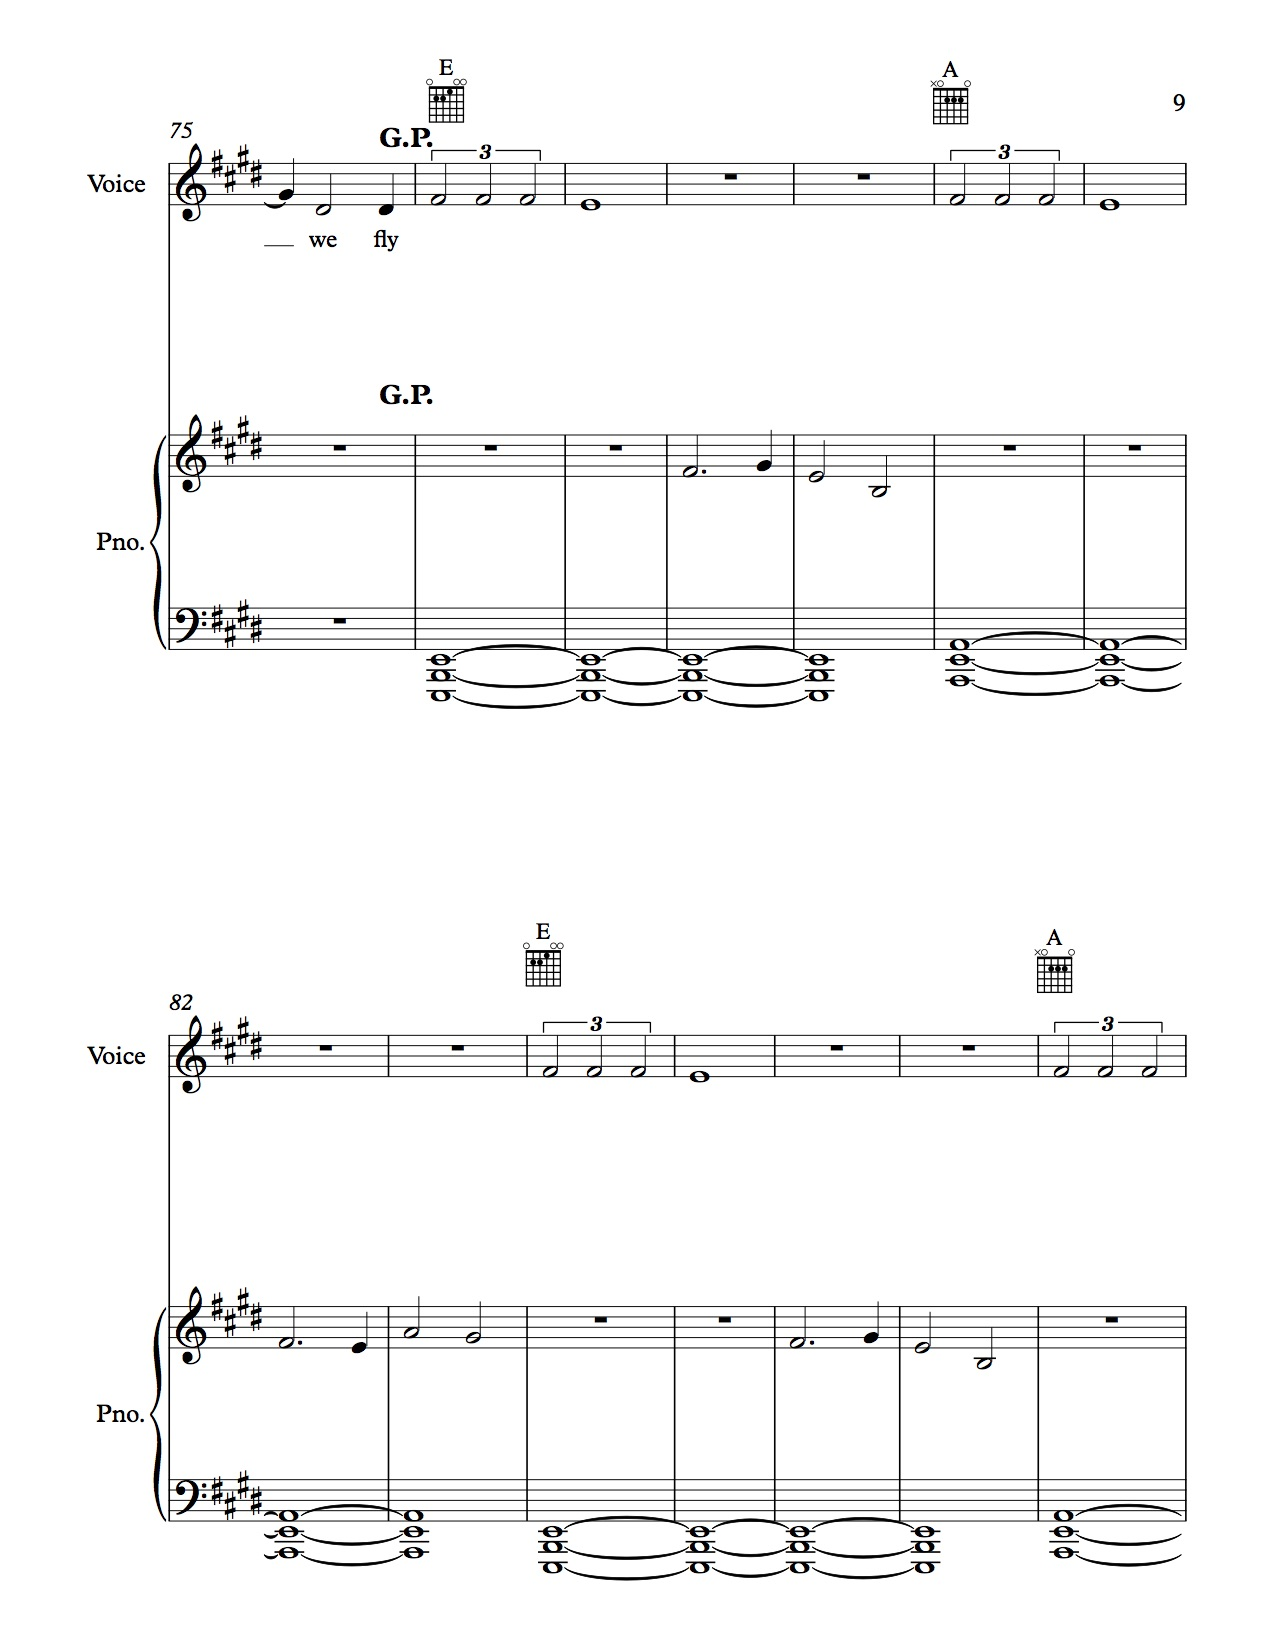 Starlight Score (1st Draft) (9).jpg